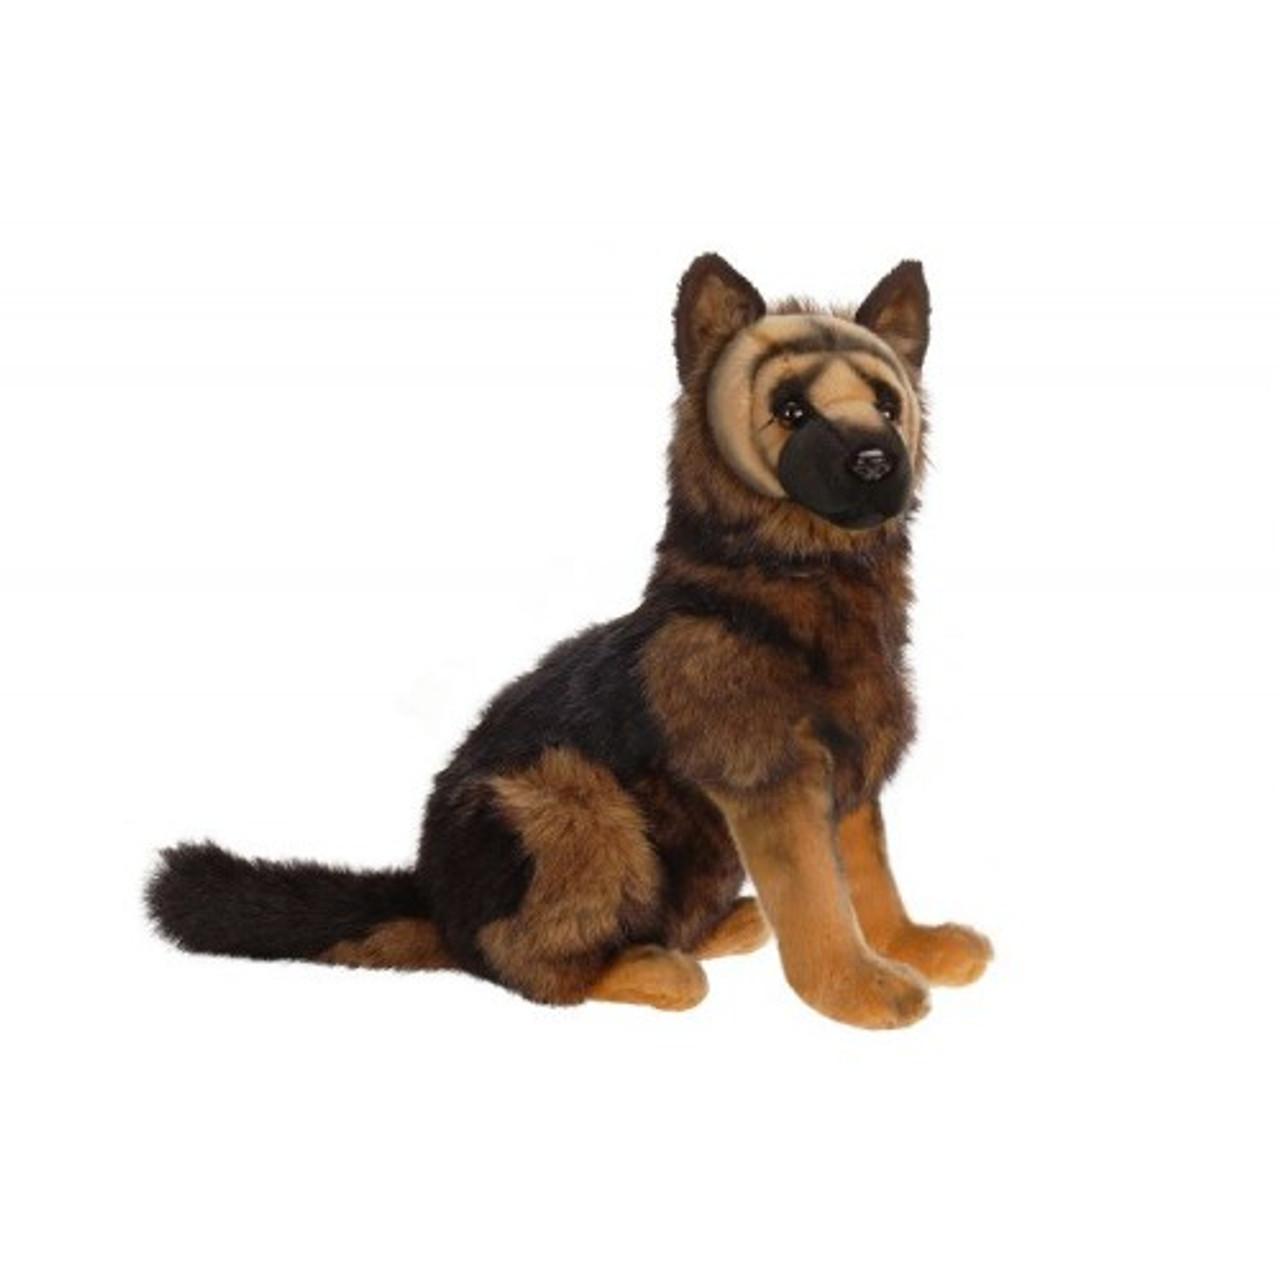 Set Of Dog Stuffed Animals, Ty Beanie Boos Spirit The German Shepherd Dog Stuffed Animal Black Brown 6 Inches Mardel 3847464